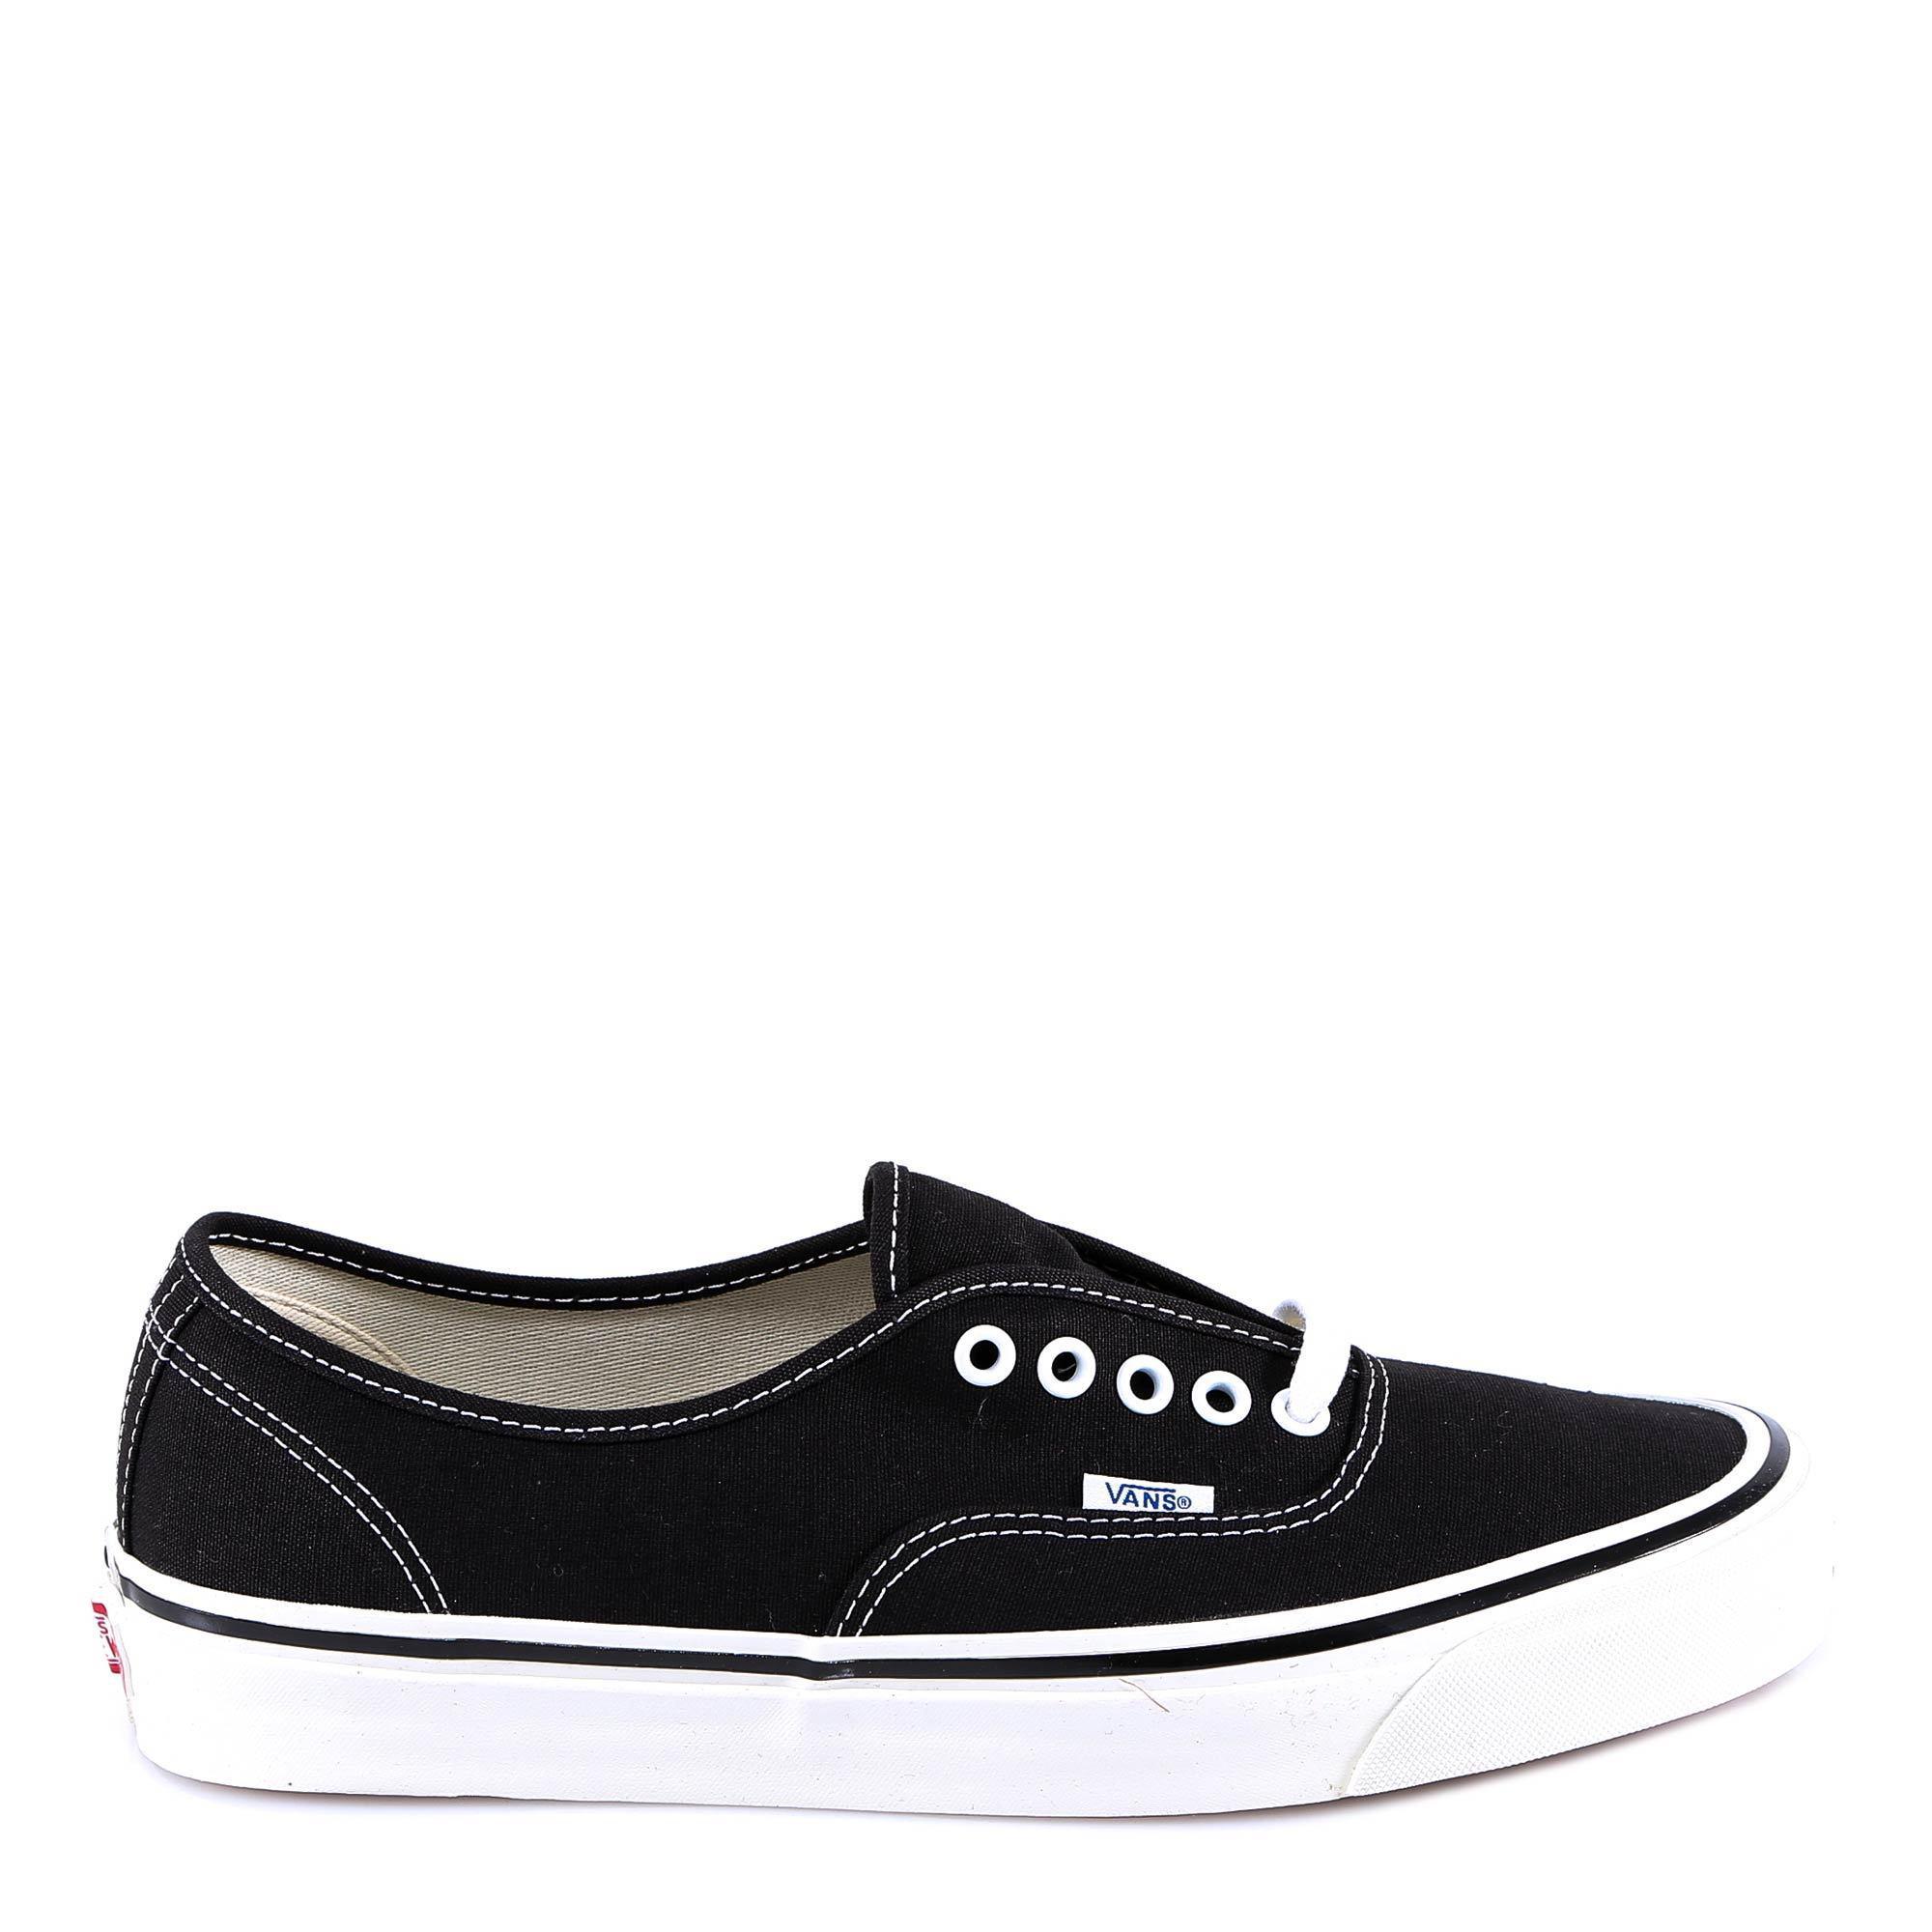 0deff51c6cc Vans Authentic 44 Dx Low-top Sneakers in Black for Men - Lyst